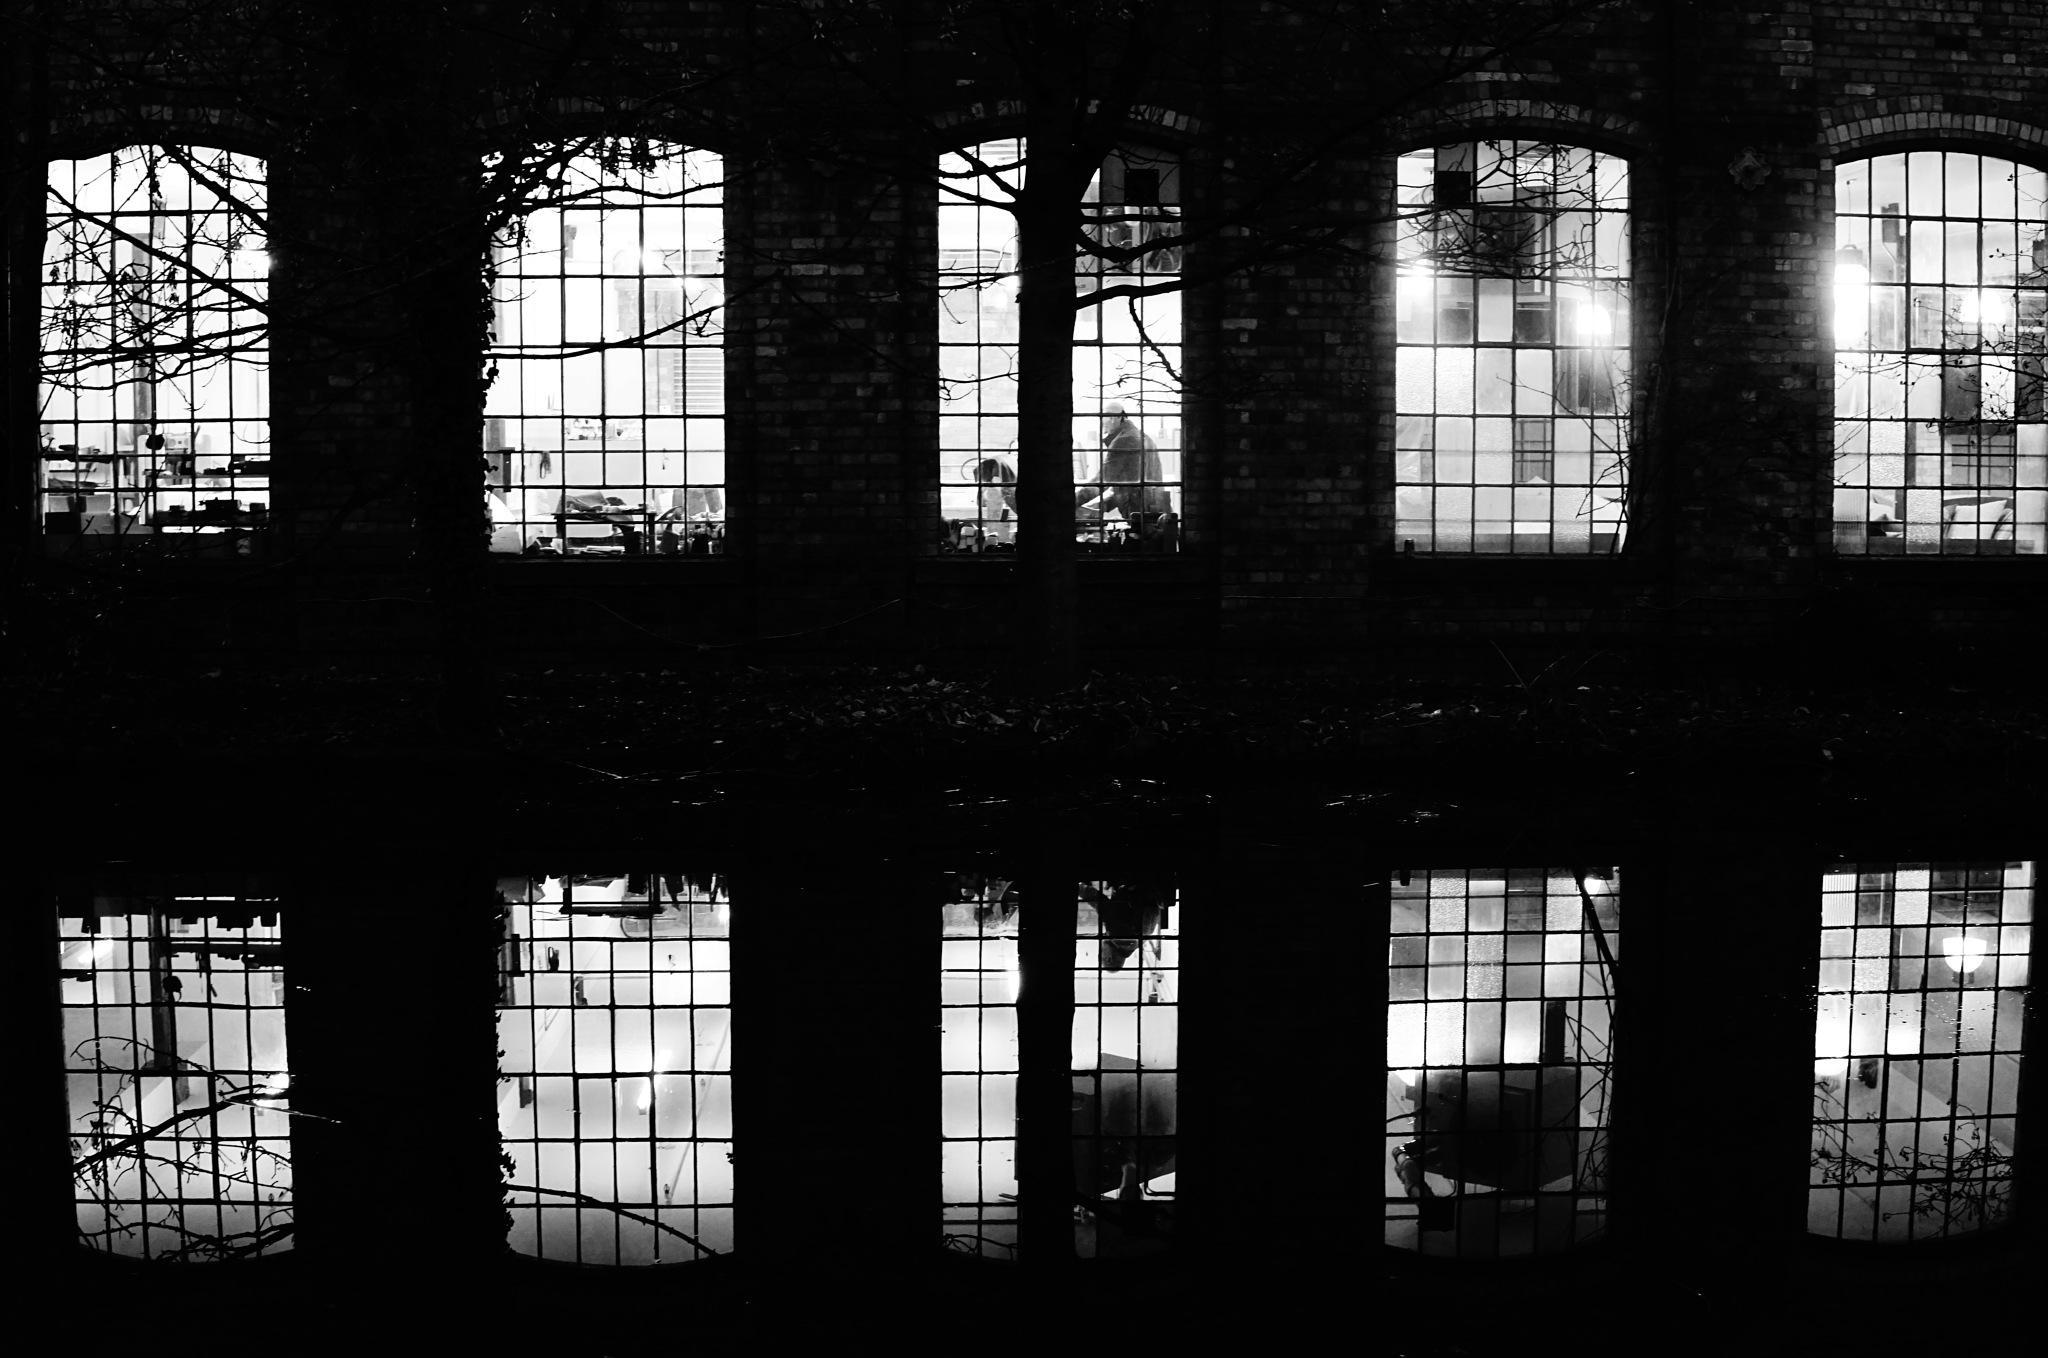 Canal factory reflection by AJ Yakstrangler Andy Jamieson